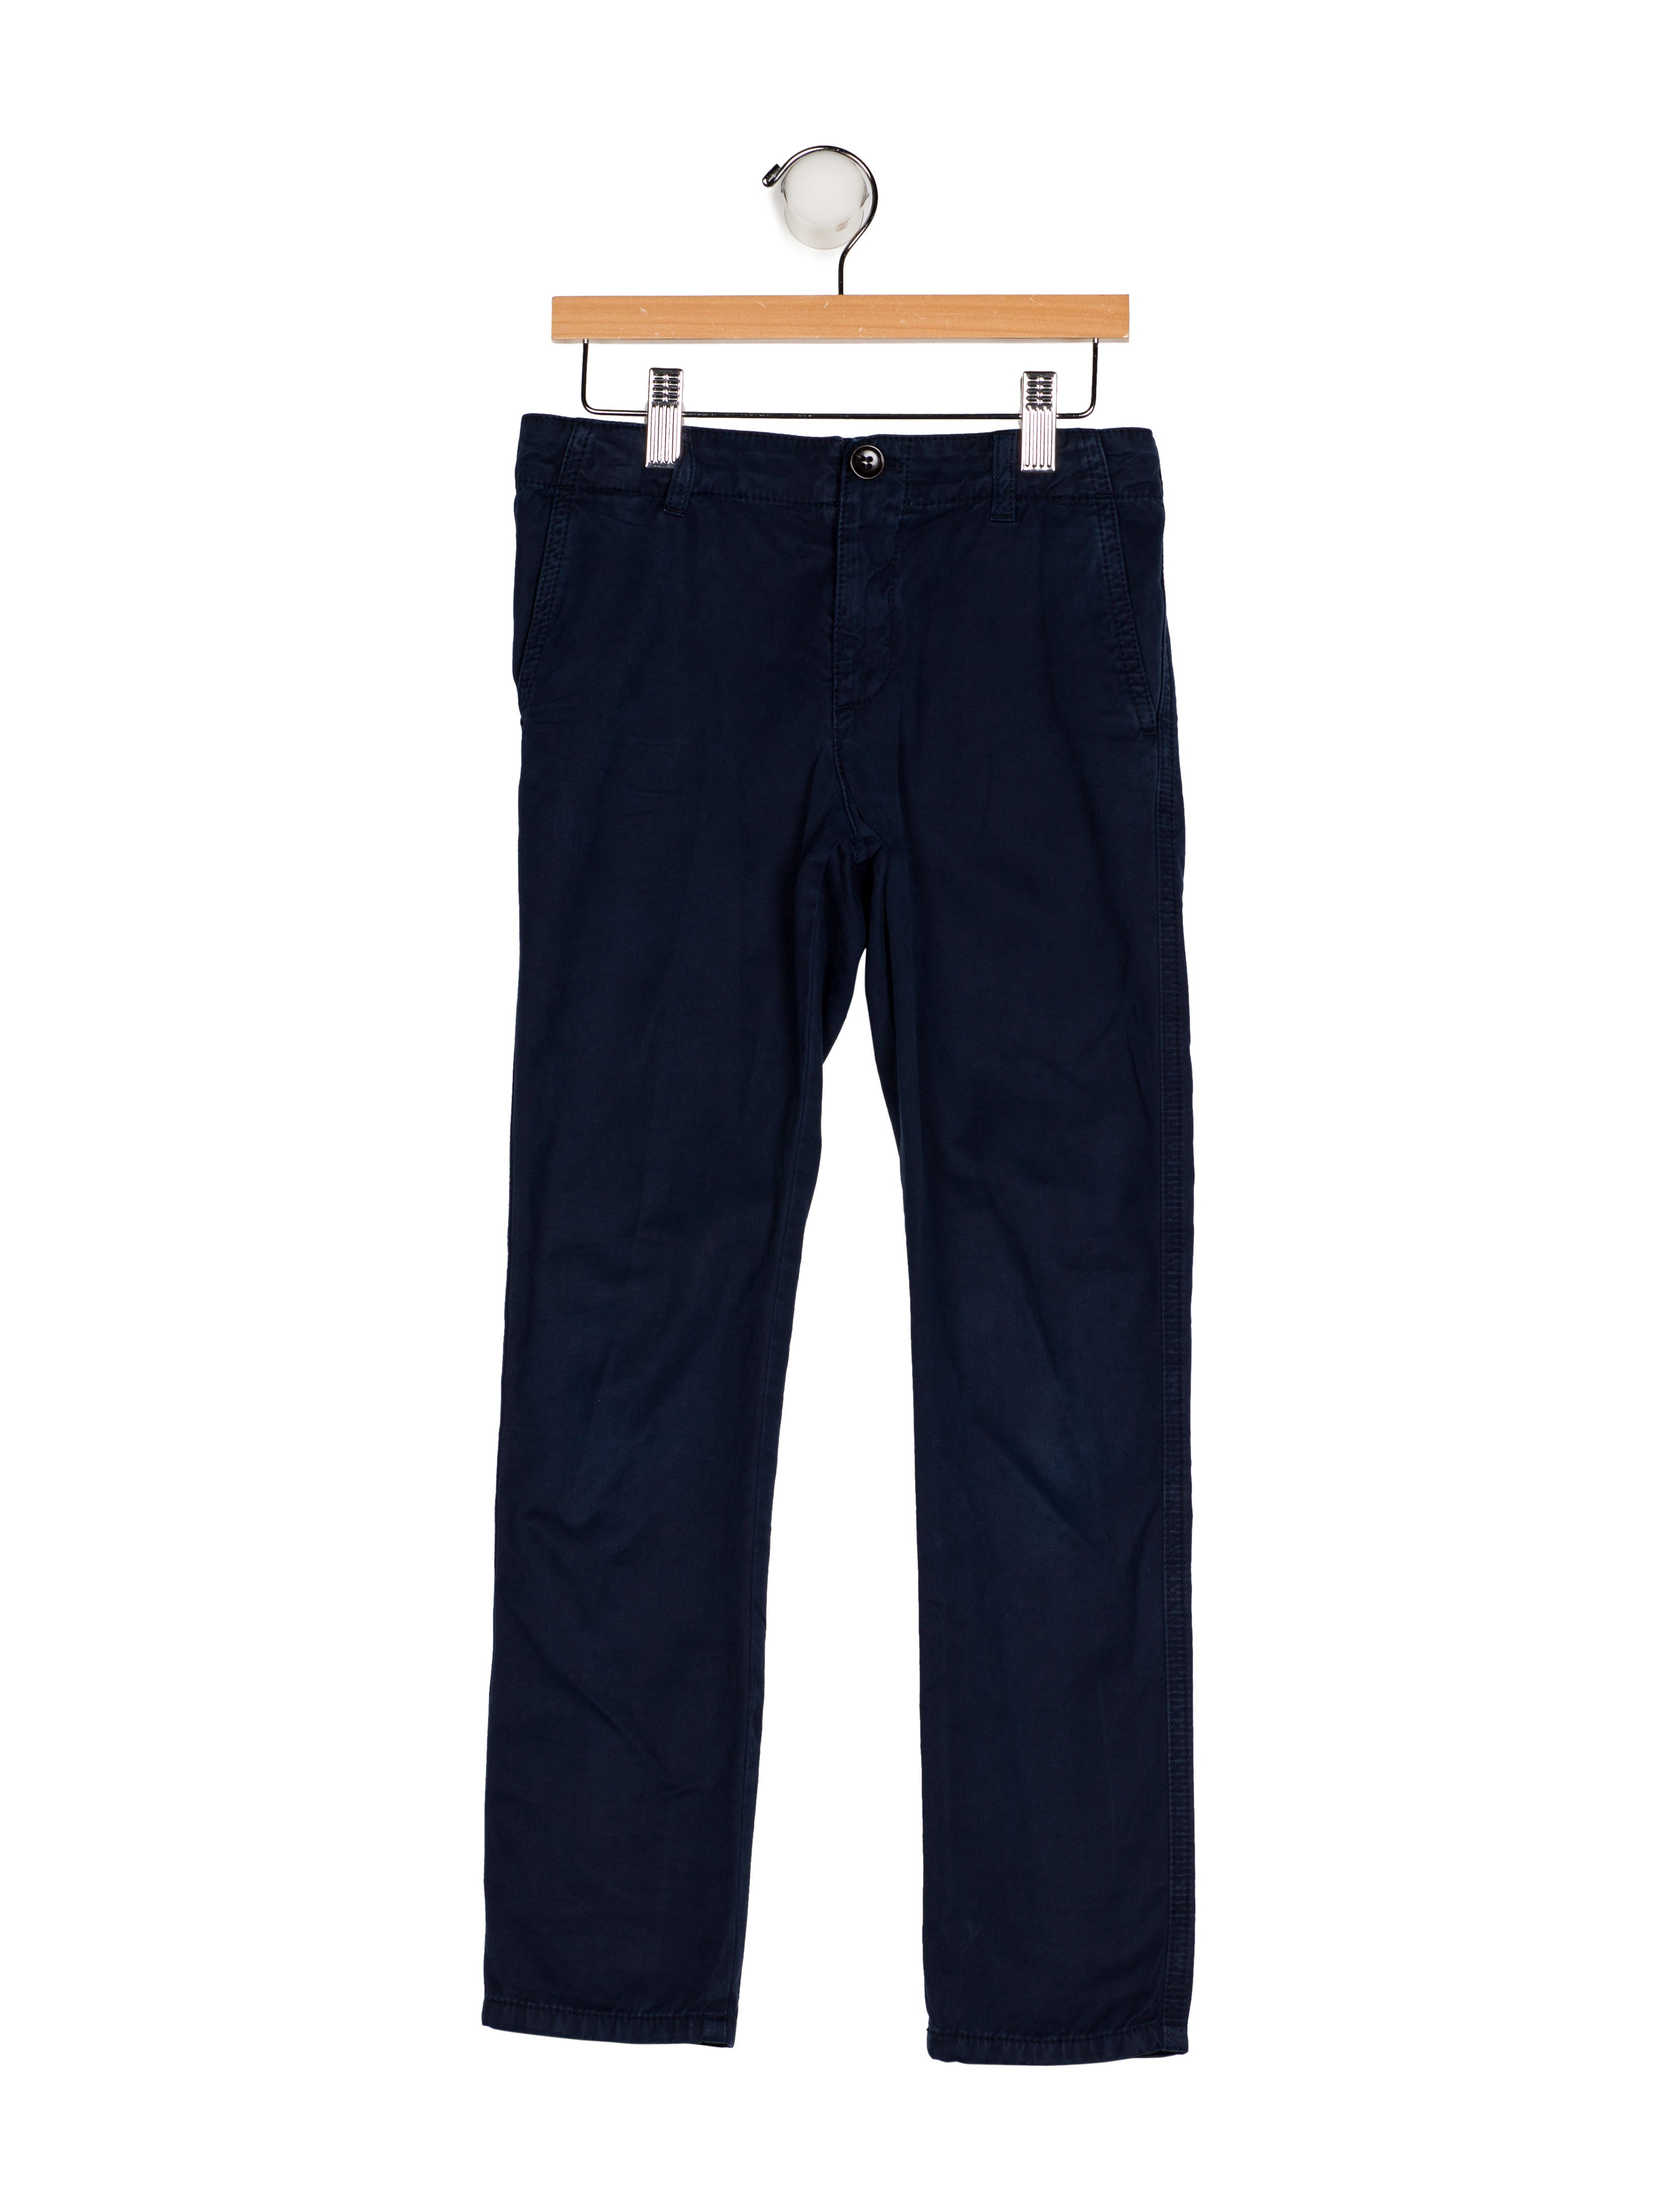 45c0471f1e8 Gucci Boys  Four Pockets Straight-Leg Pants - Boys - GUC234081